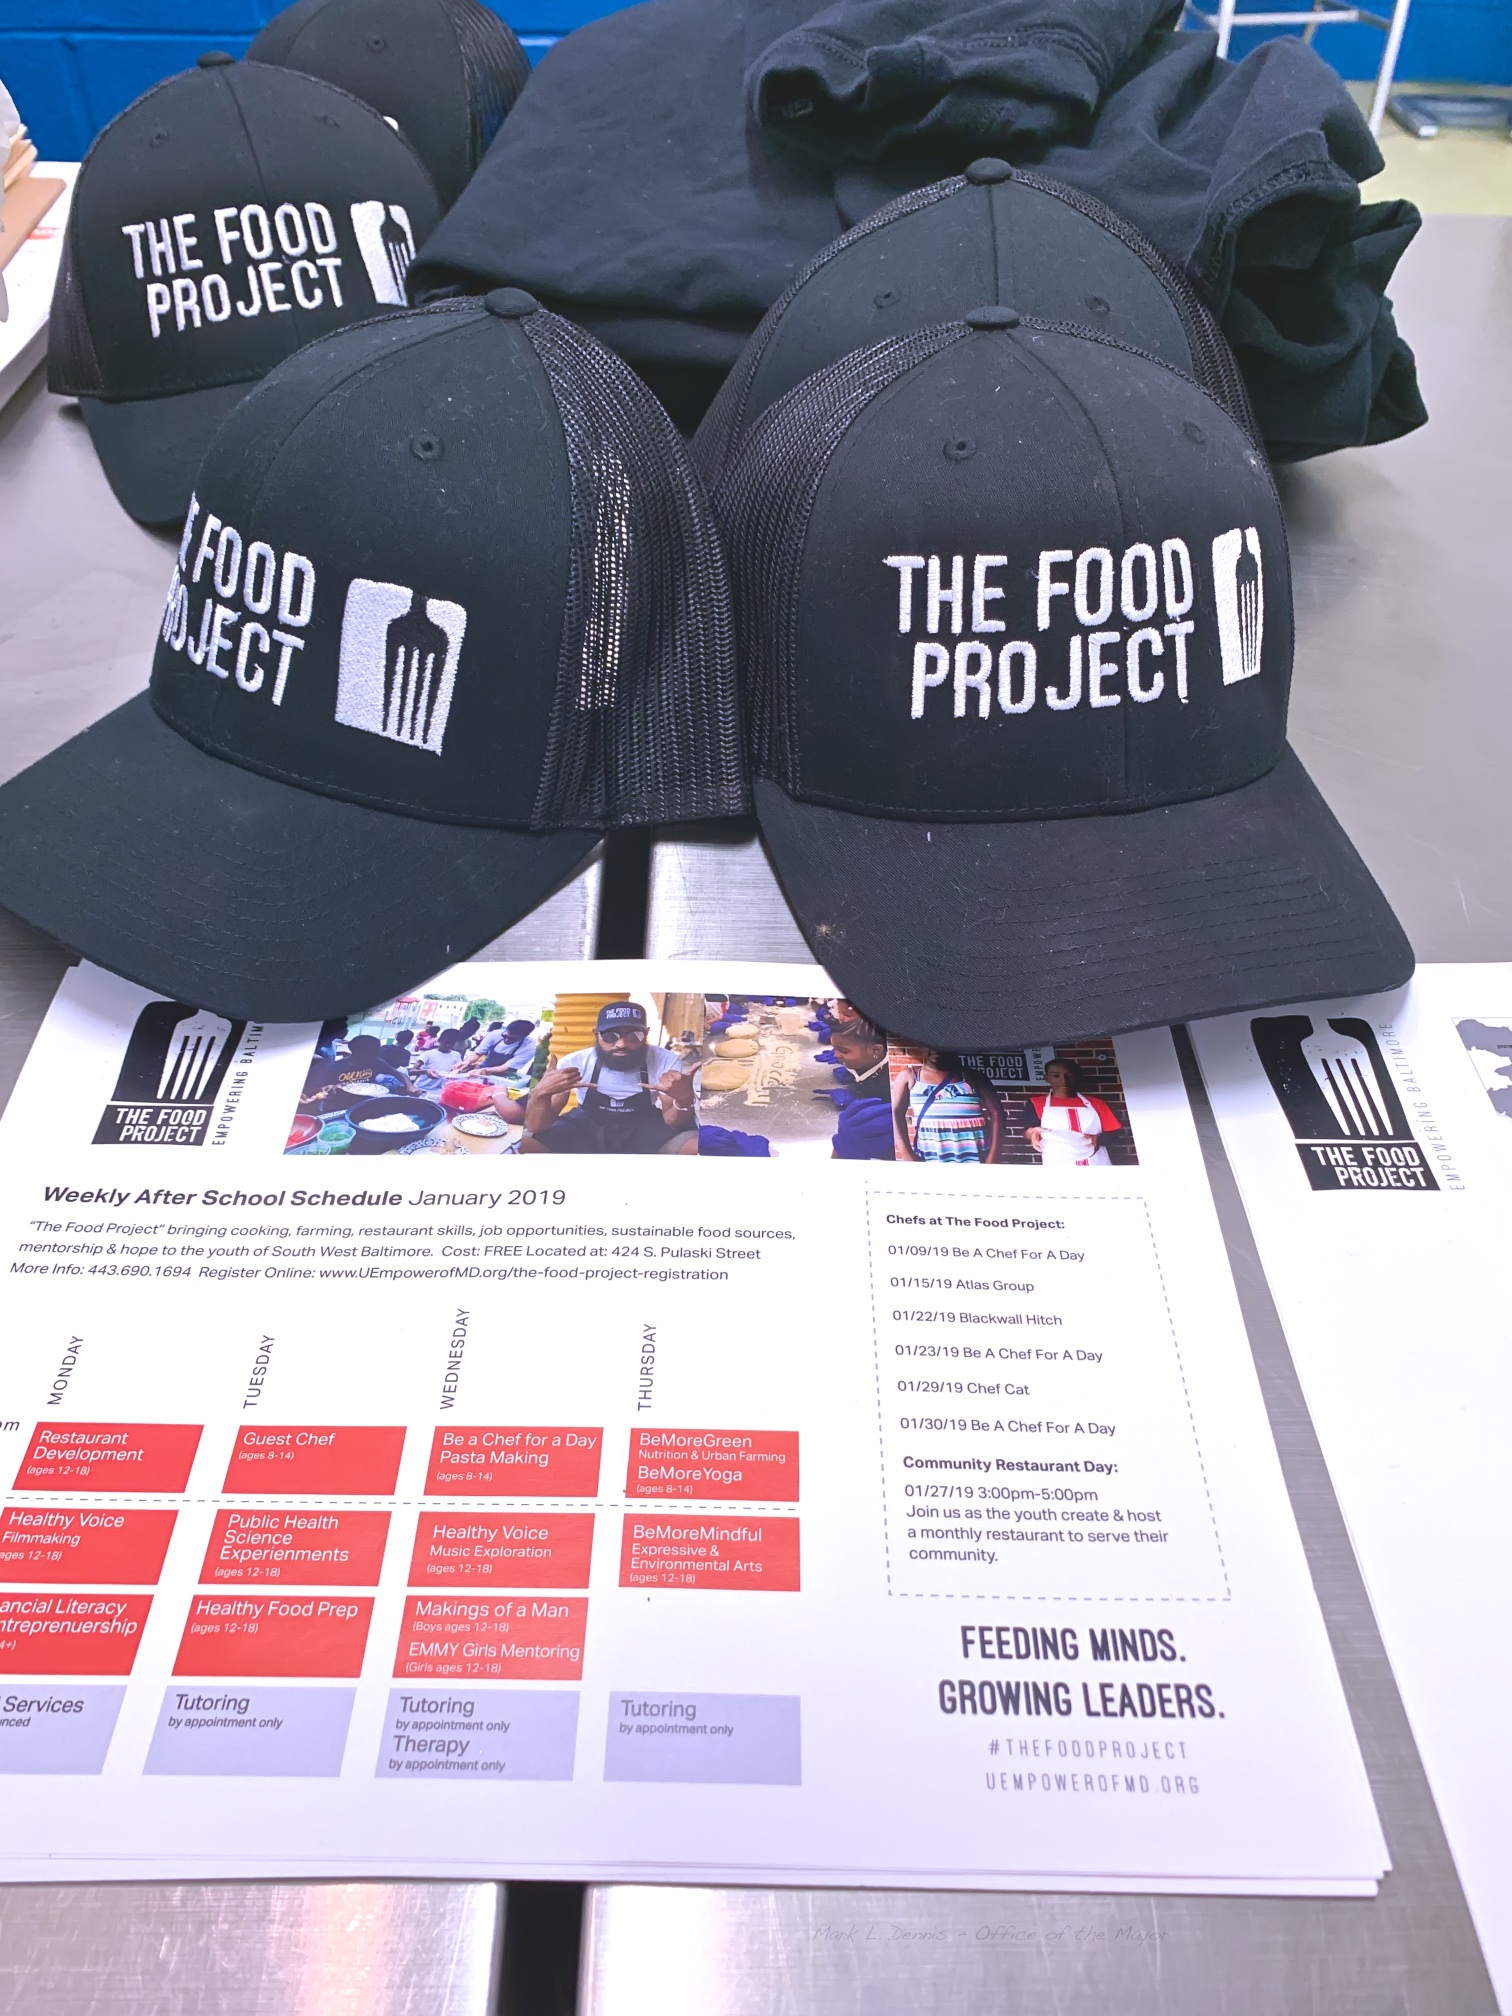 January 26, 2019 - Site visit to The Food Project, 424 S. Pulaski Street 2019-01-26.jpg